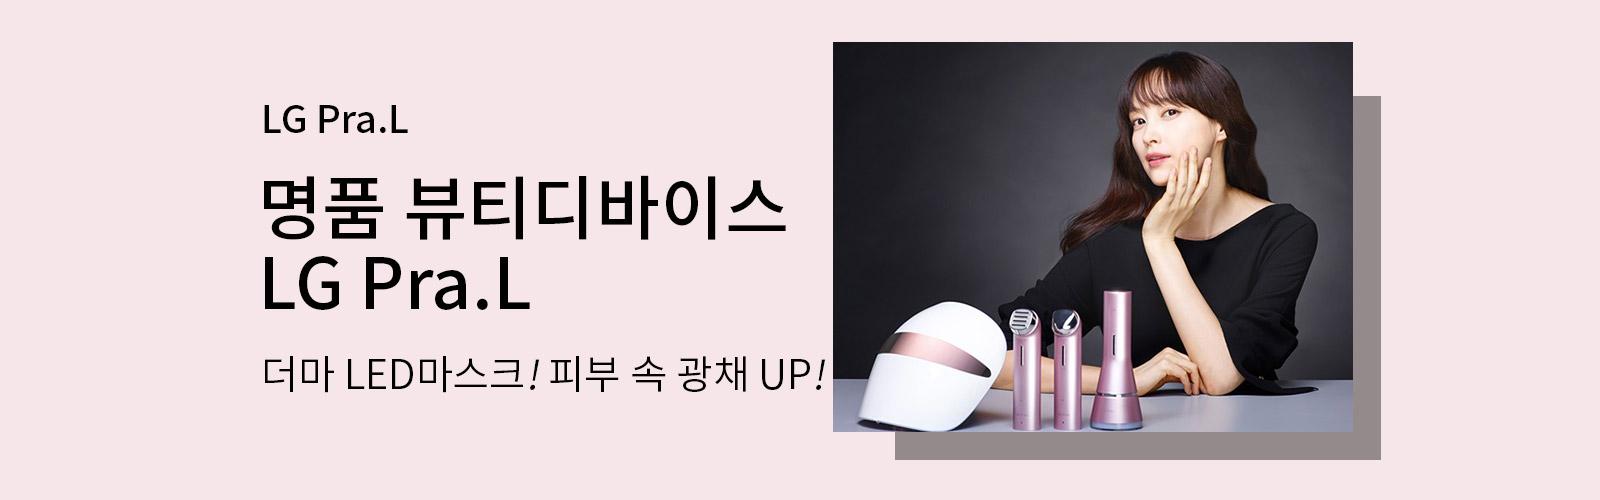 LG Pra.L 명품 뷰티디바이스 LG Pra.L 더마 LED마스크! 피부 속 광채 UP!